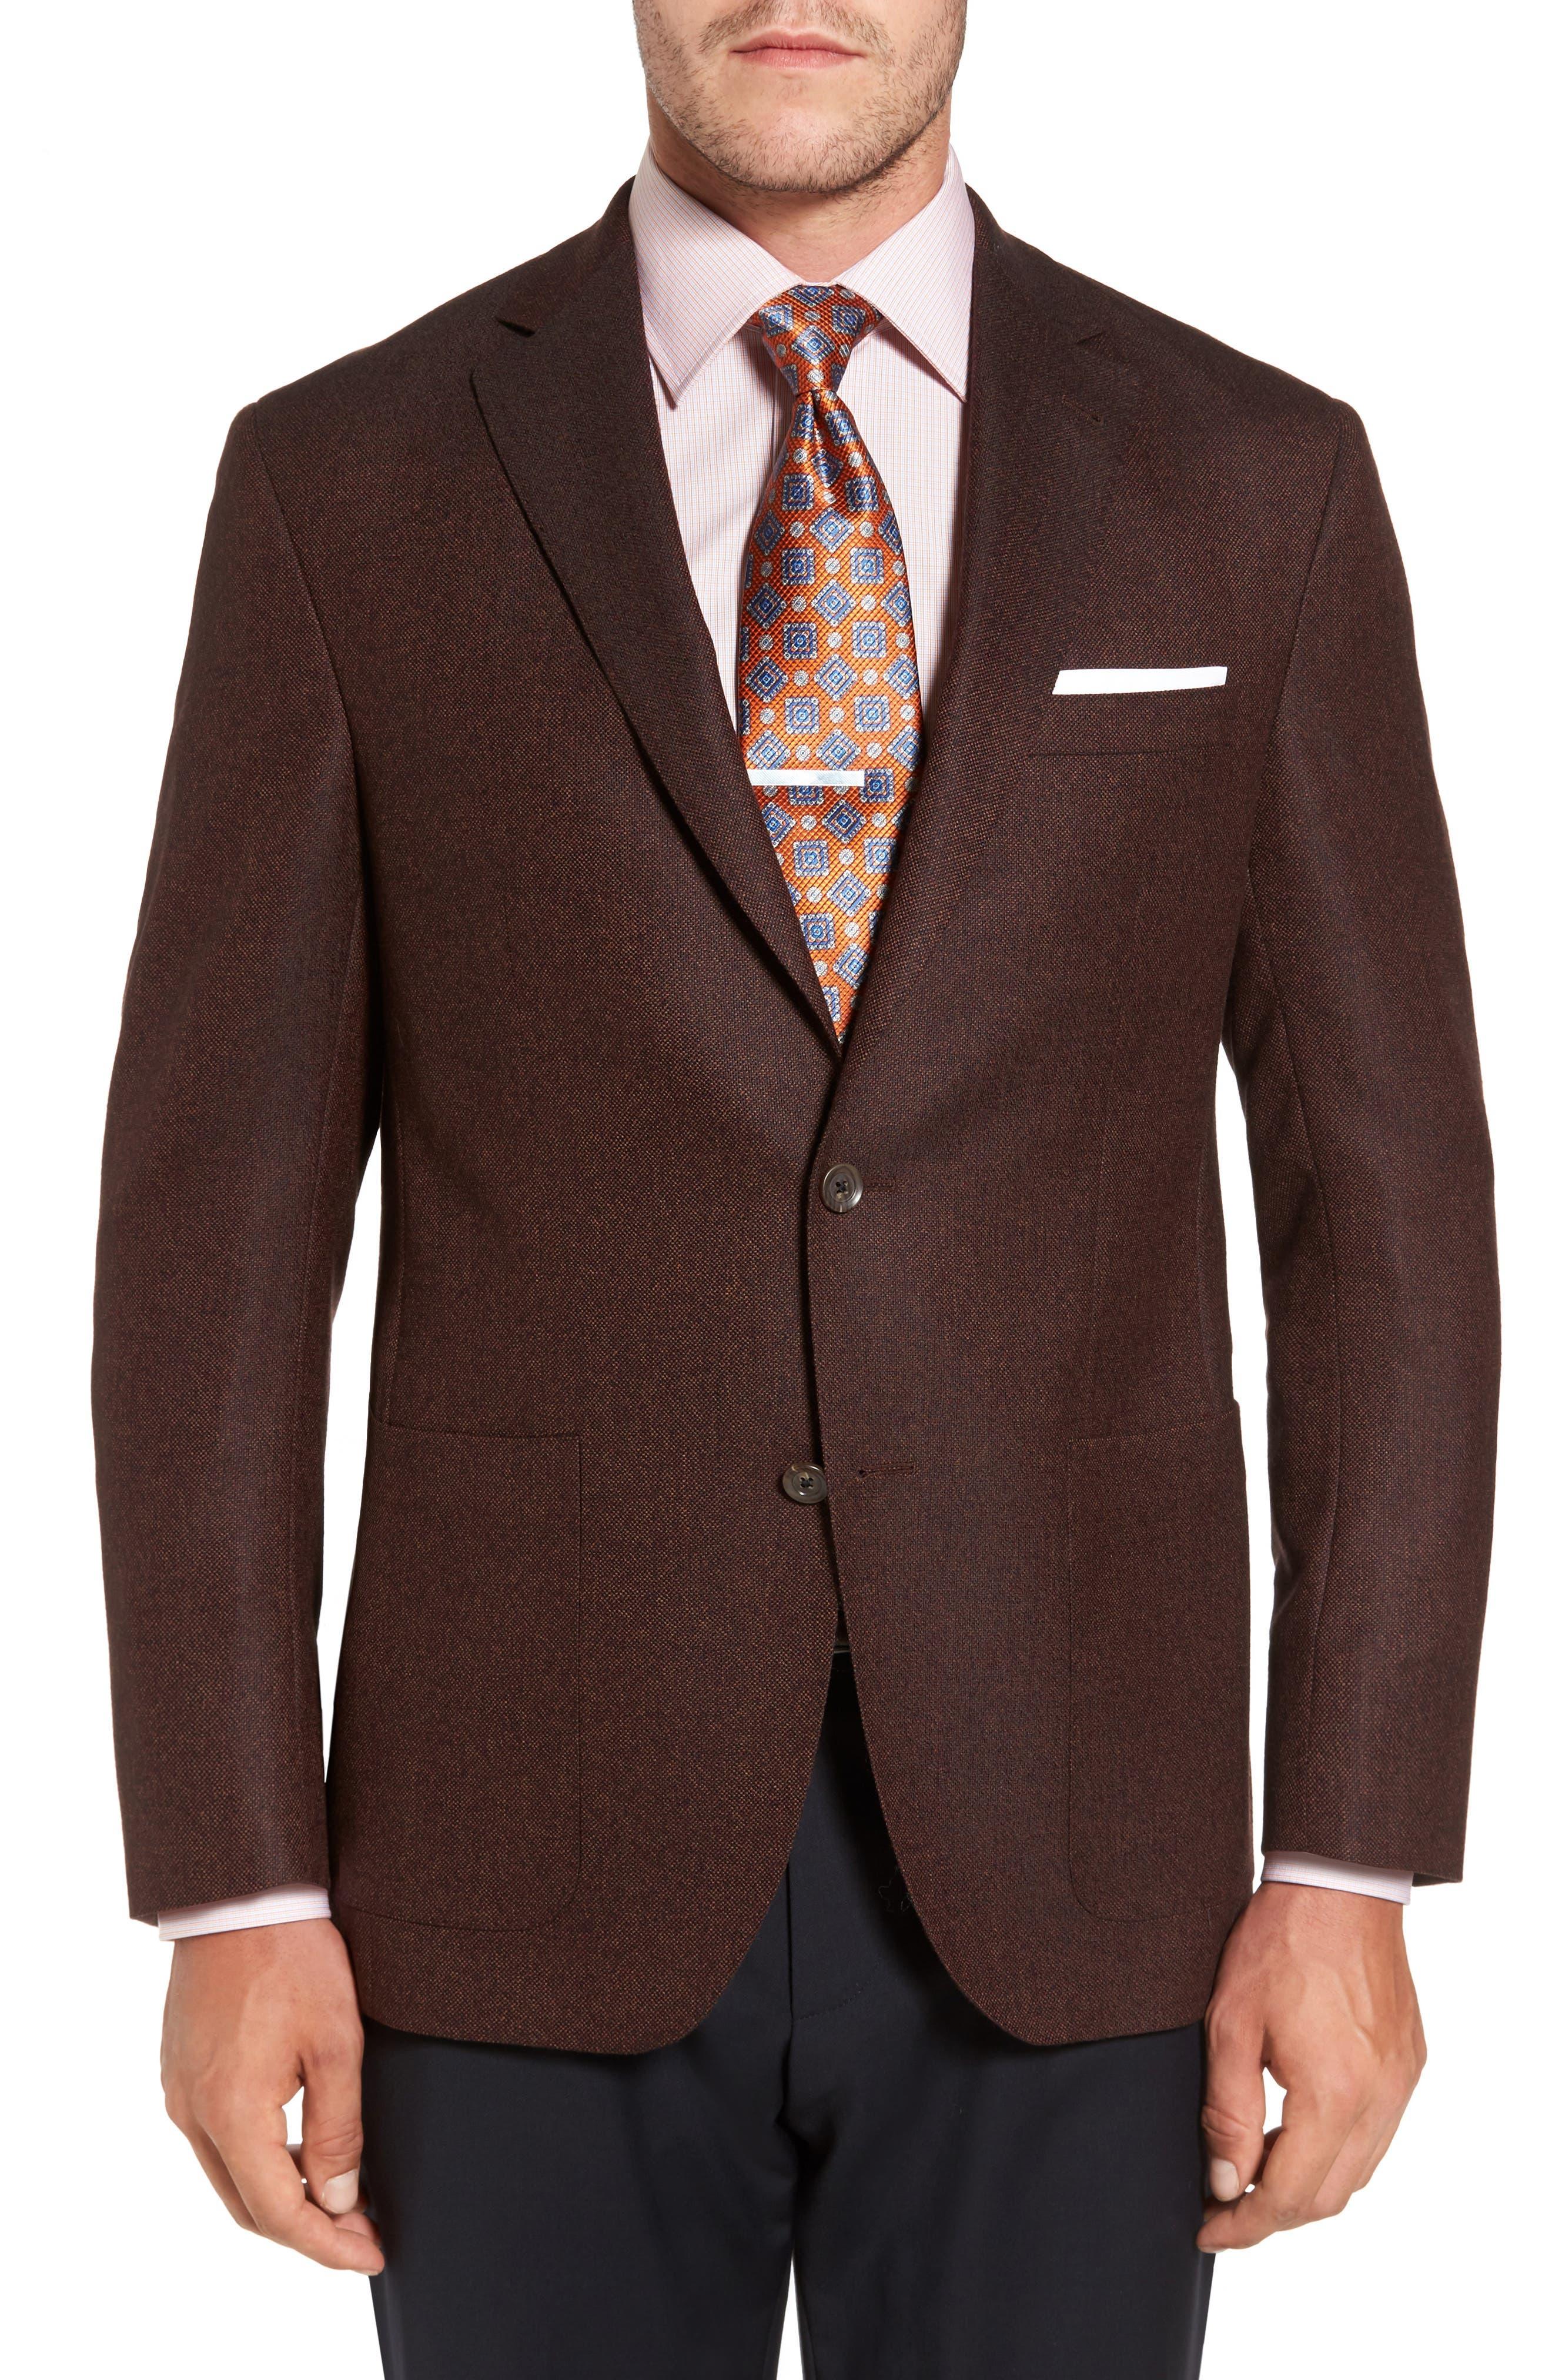 Aiden Classic Fit Wool Sport Coat,                             Main thumbnail 1, color,                             252